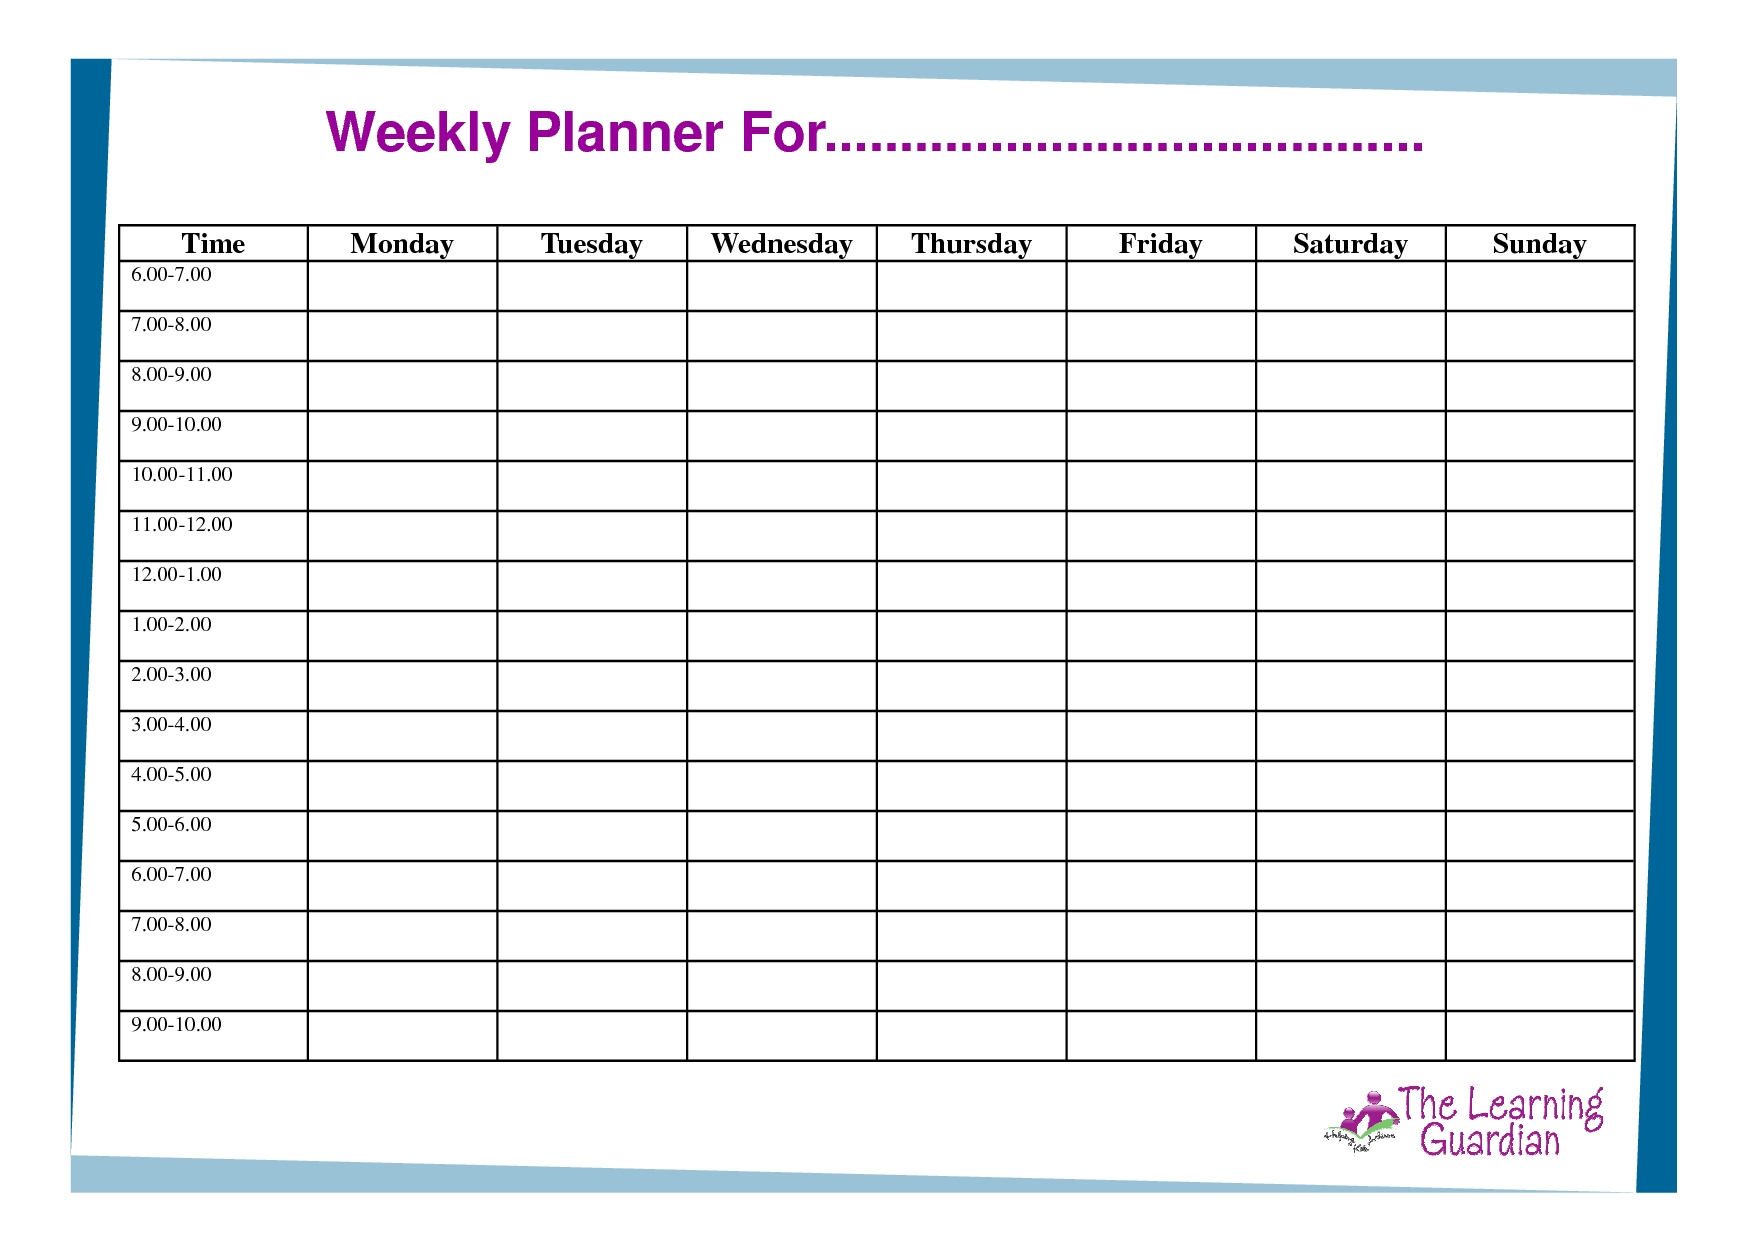 Free Printable Weekly Calendar Templates | Weekly Planner-Weekly Calendar Templates Free Printable Monday-Friday